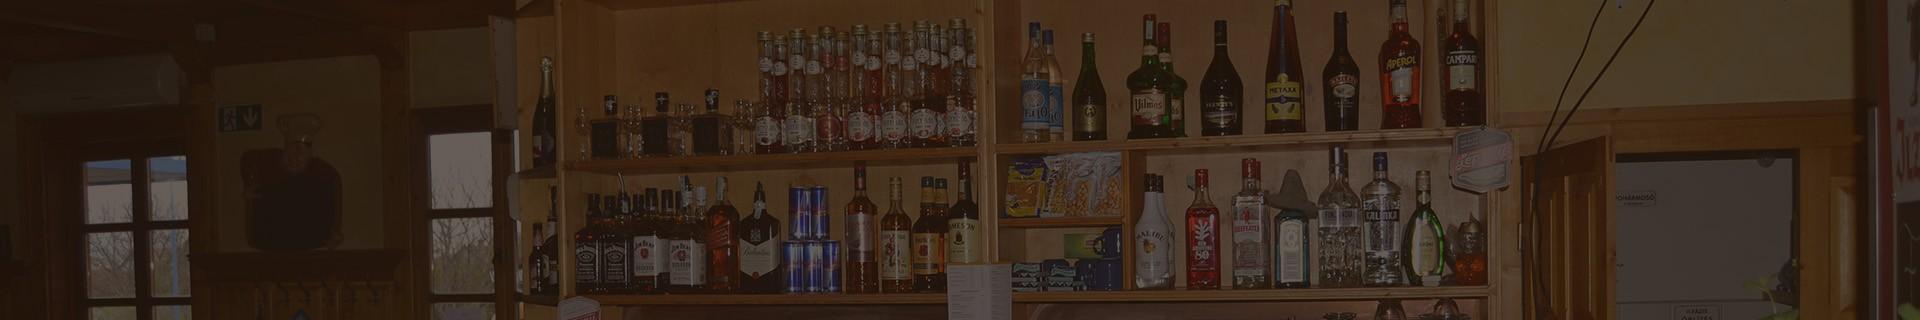 Ilzer Bár Monor - Hangulatos pub